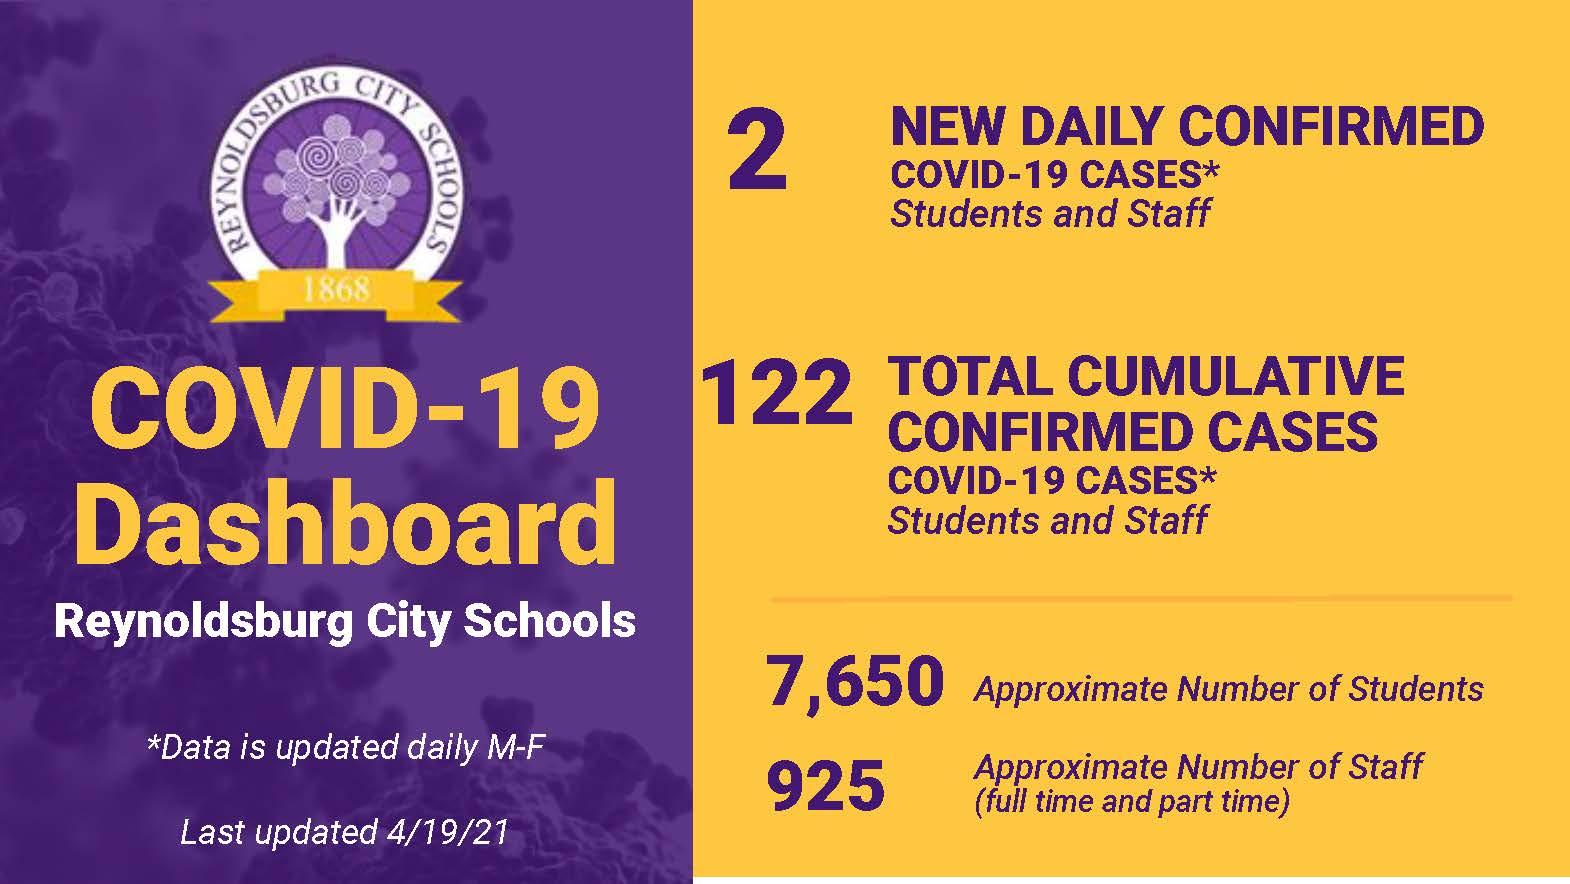 Daily COVID-19 Report